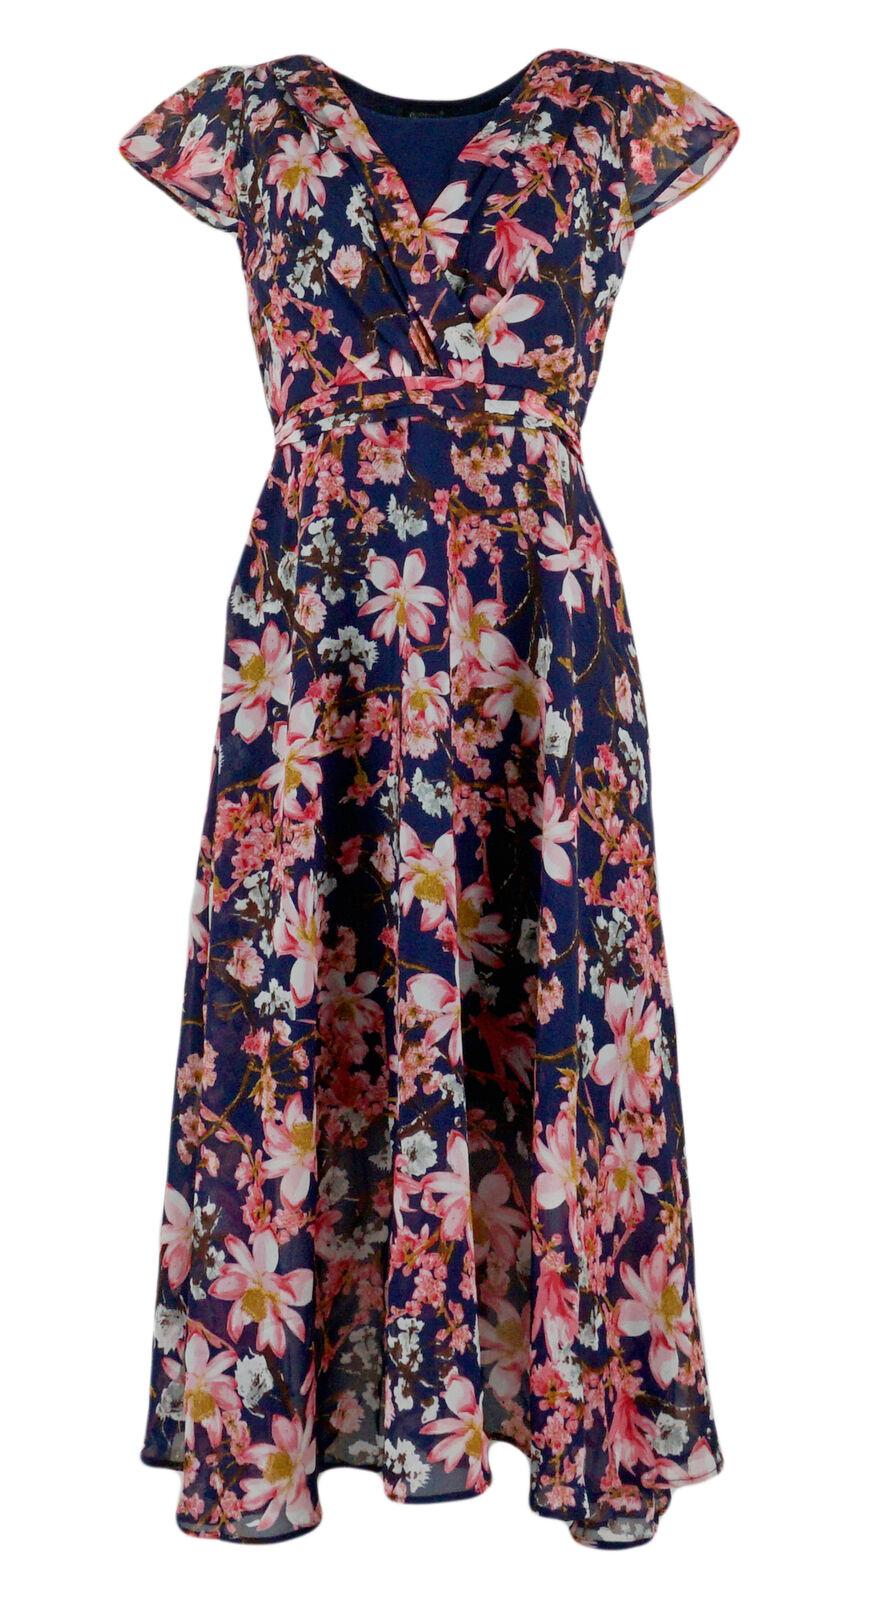 Damen SOMMERKLEID Blumenkleid Kleid Strandkleid Beachwear blau mit Blumen